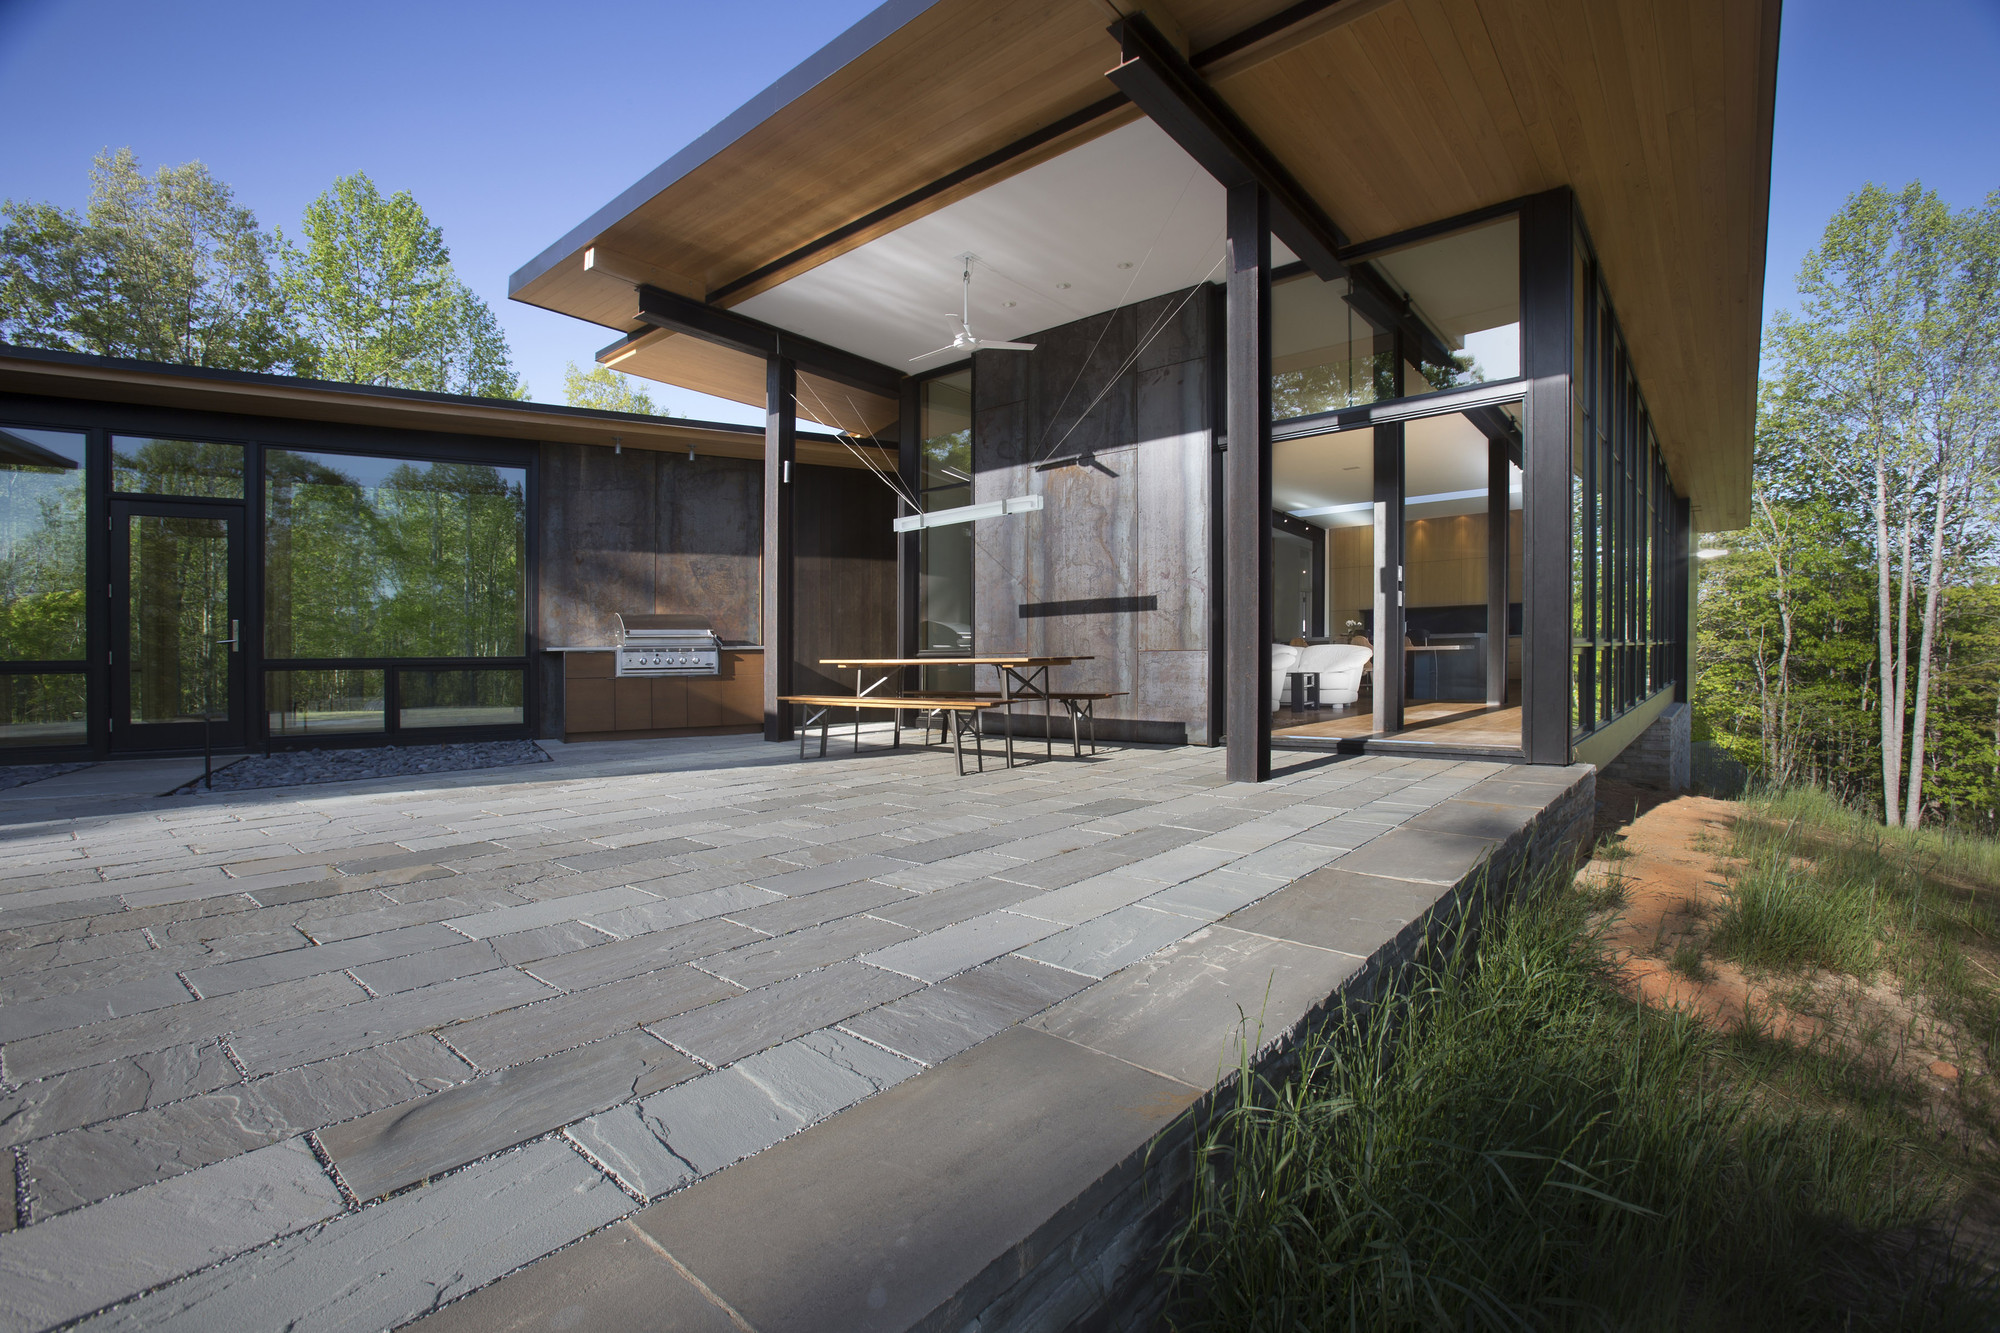 Mountain View Home Unites with Surrounding Landscape / Carlton Architecture + DesignBuild   ArchDaily